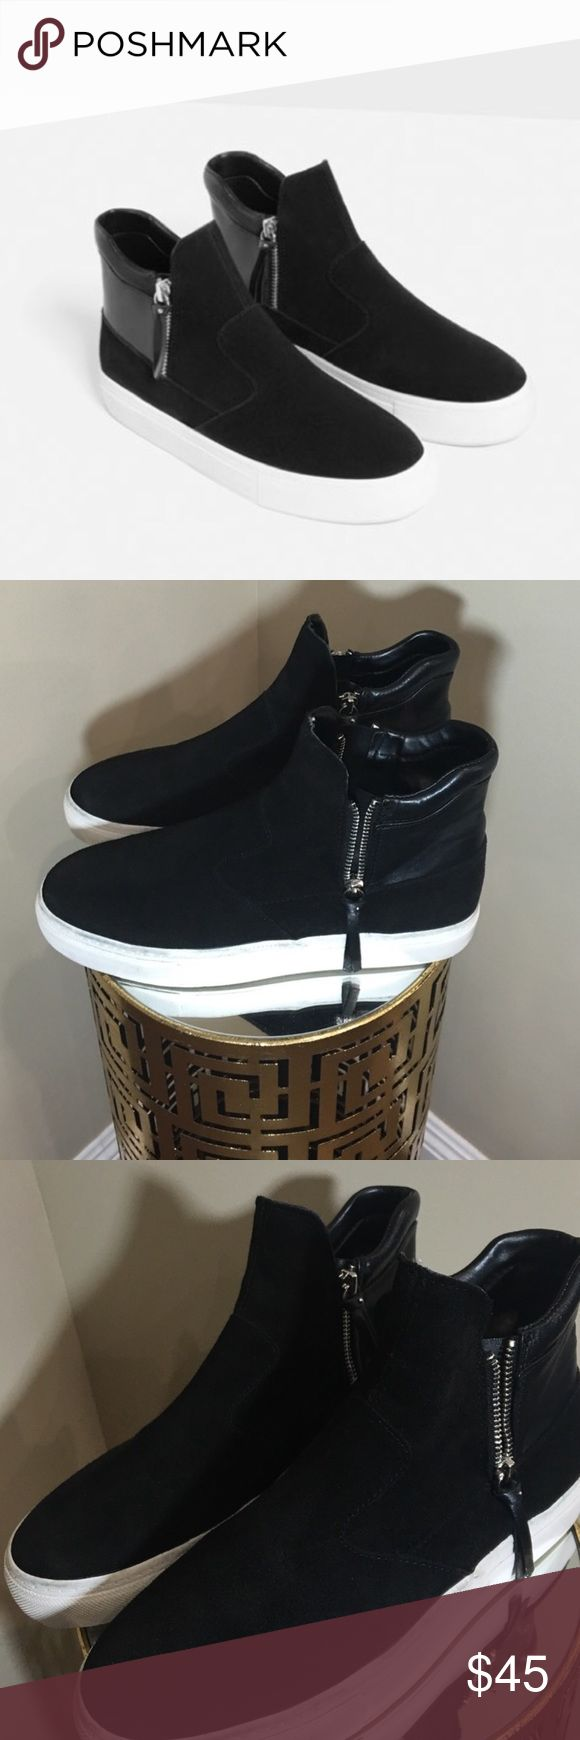 Zara high top sneakers Zara flat black leather high top sneakers with zippers on the side. Zara Shoes Sneakers